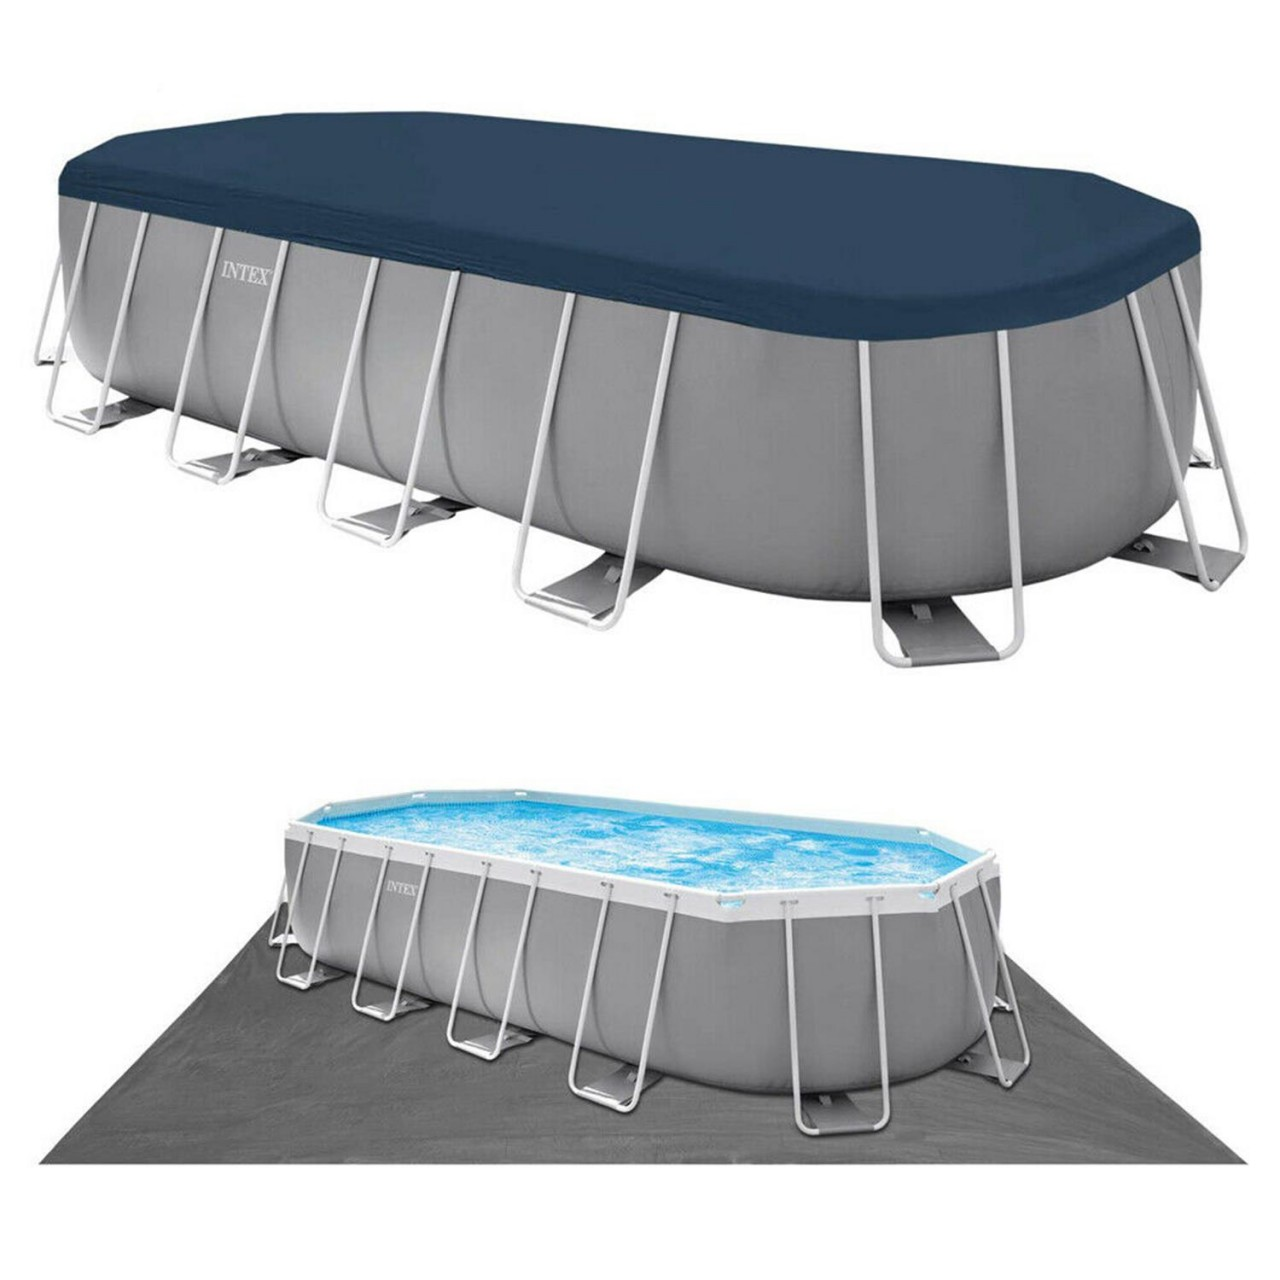 Intex Prism Frame Oval Pool Swimming Pool 610x305x122 cm Schwimmbad Filterpumpe